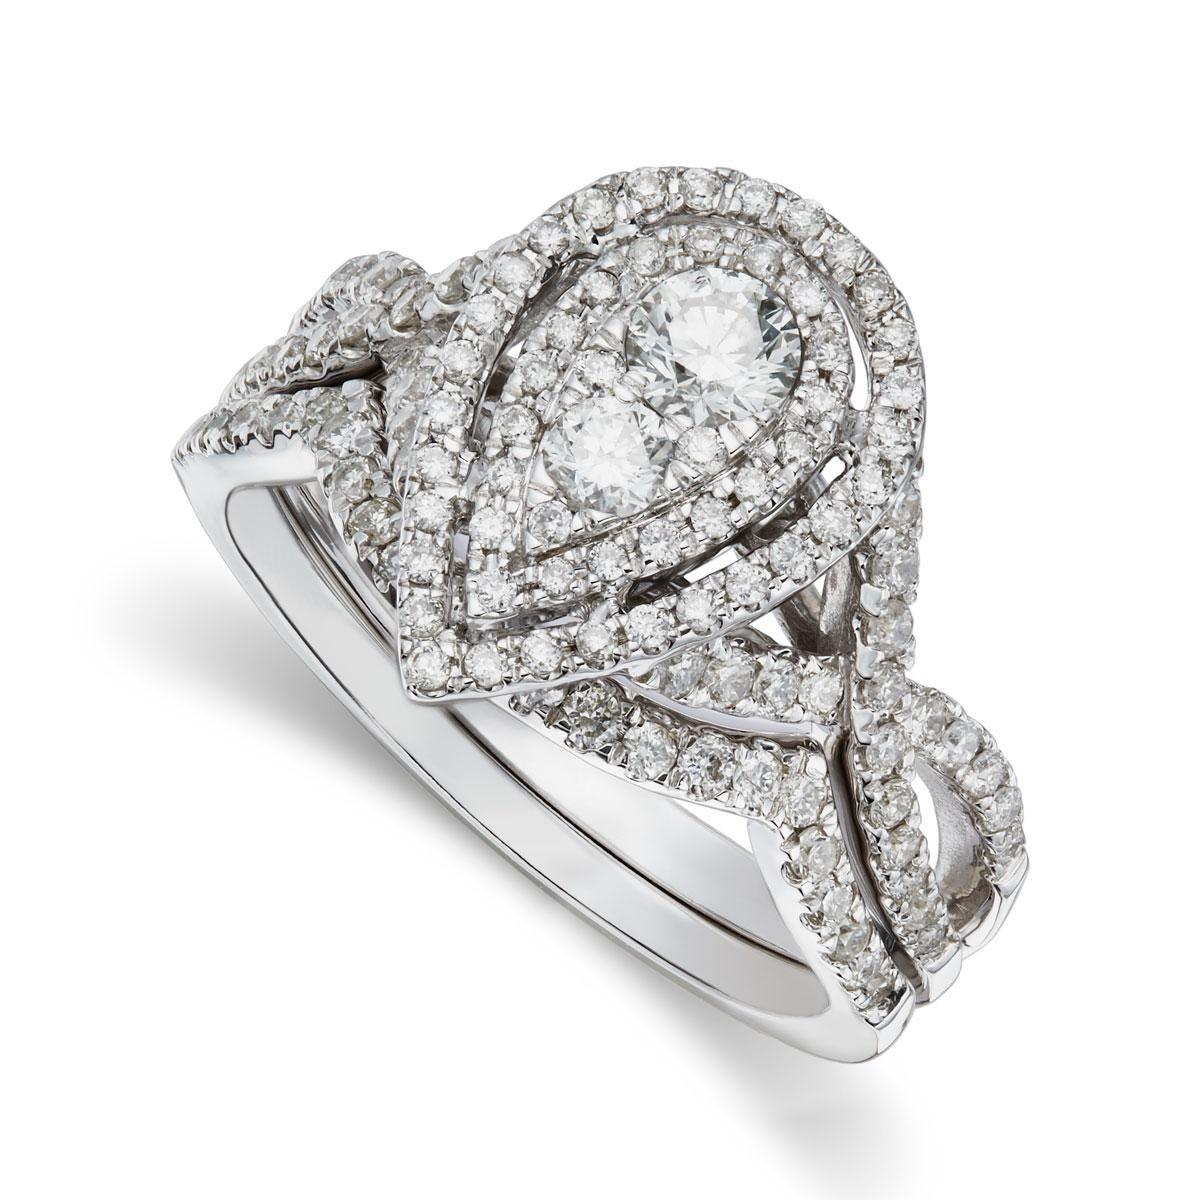 pear shaped wedding ring diamond rings ctw round and pear shape bridal set wedding rings